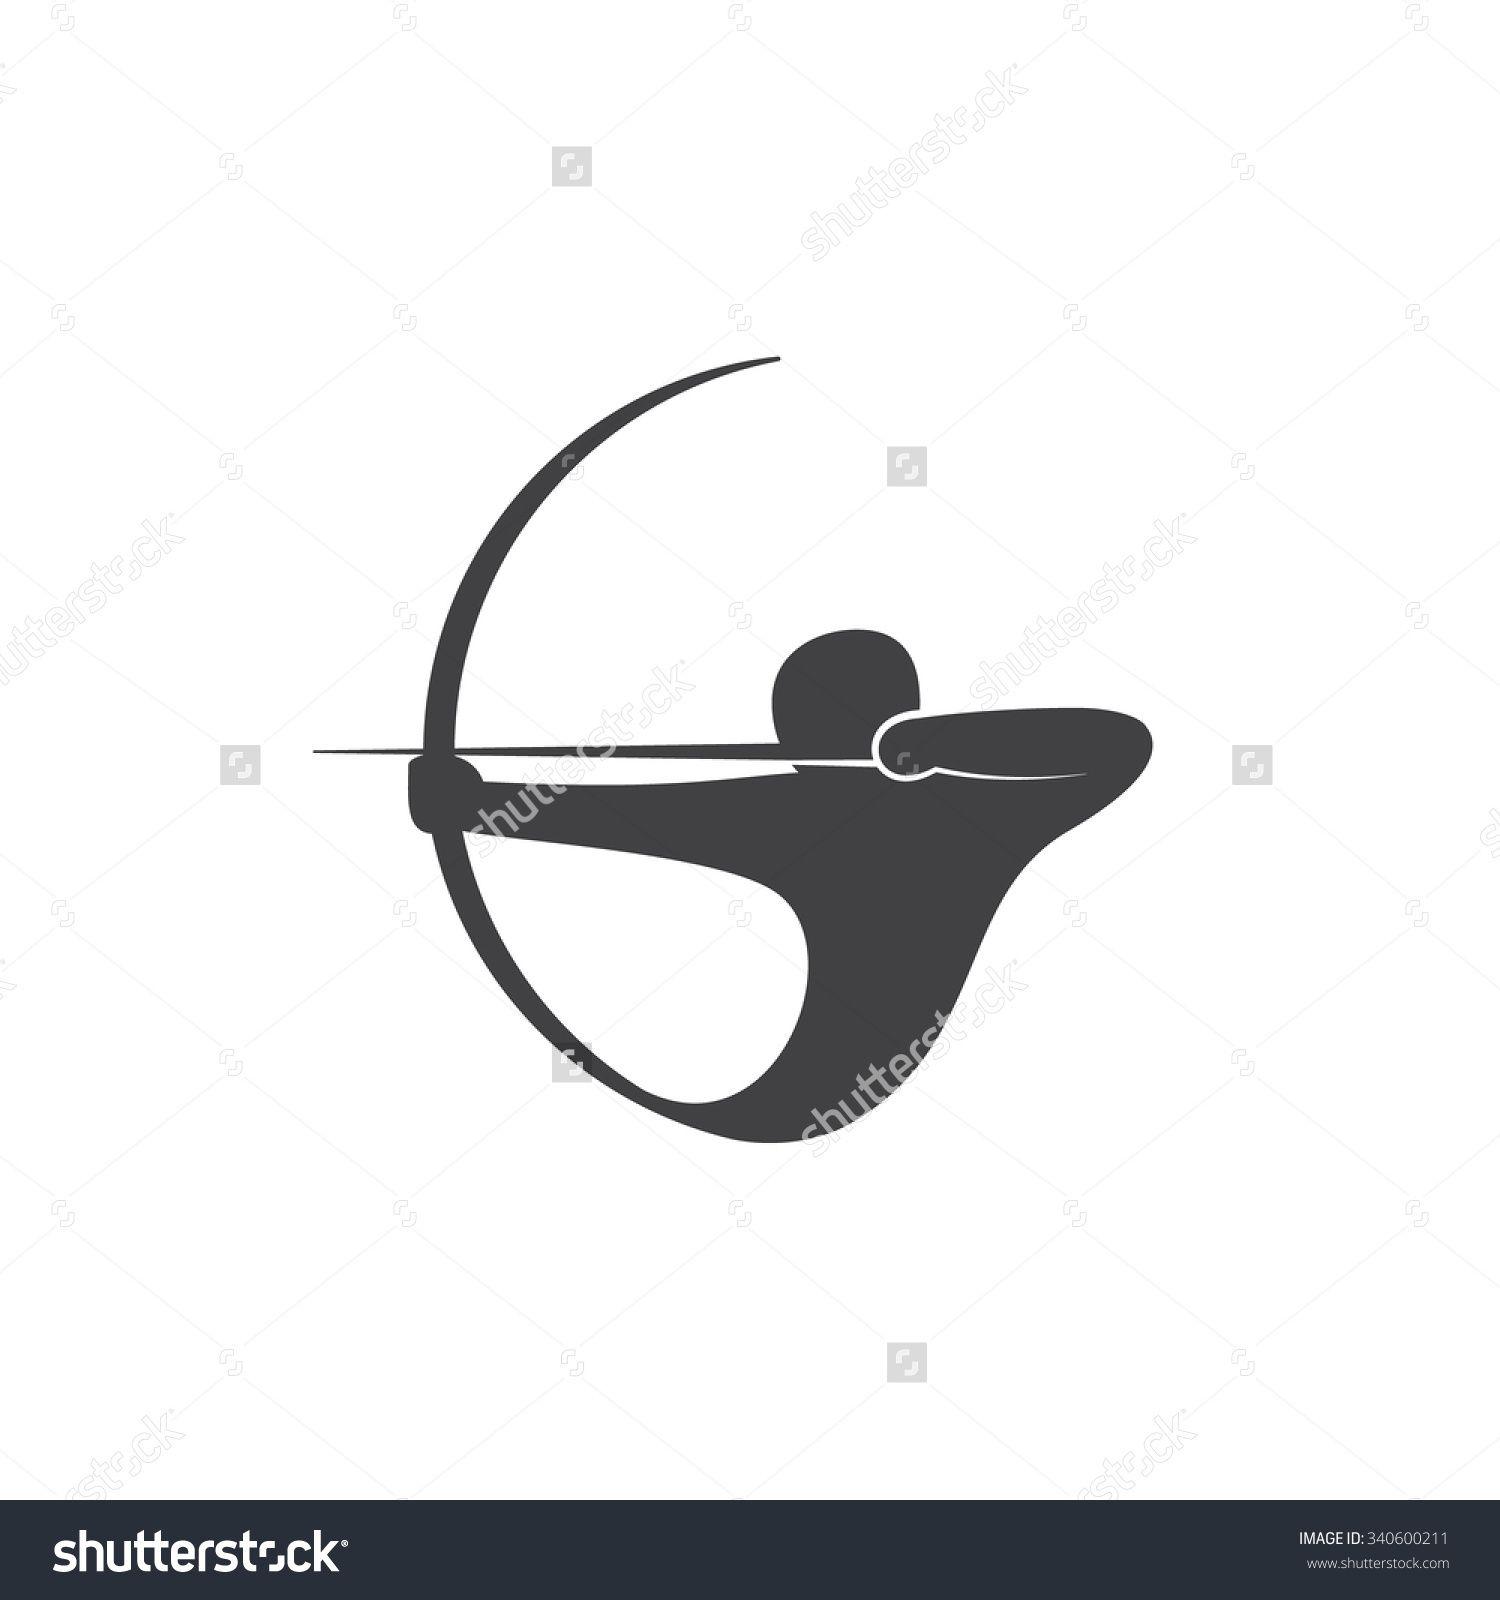 Archery clipart abstract. Archer stock vectors vector